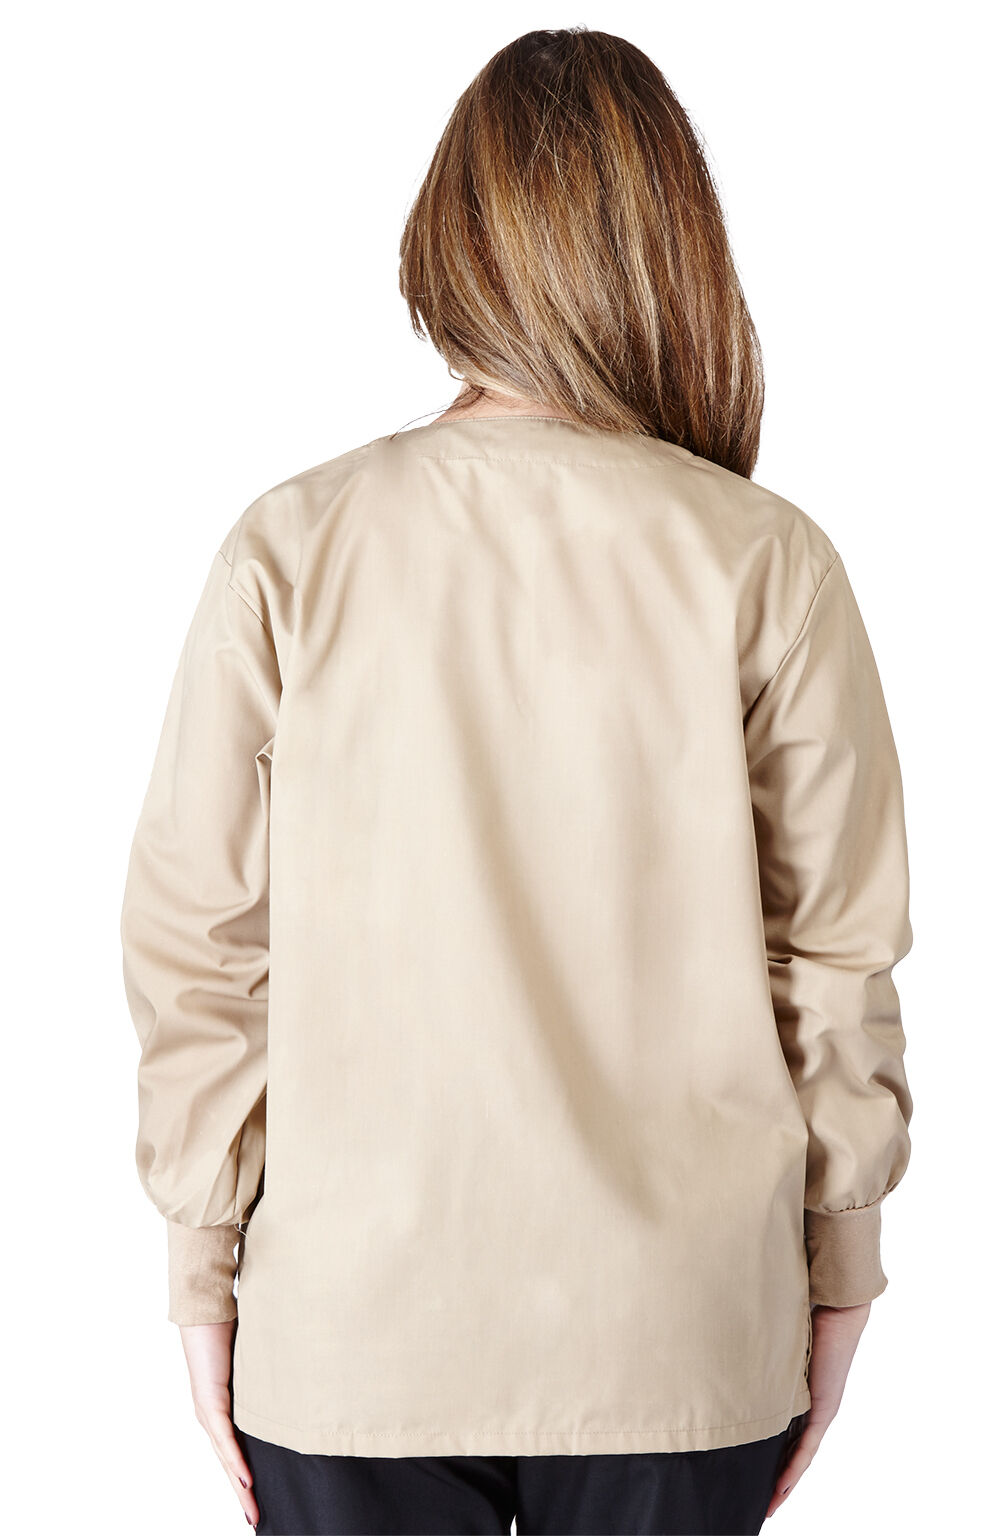 Medical Nursing NATURAL UNIFORMS Warm Up Top Scrubs Jackets Lab Coats for Women